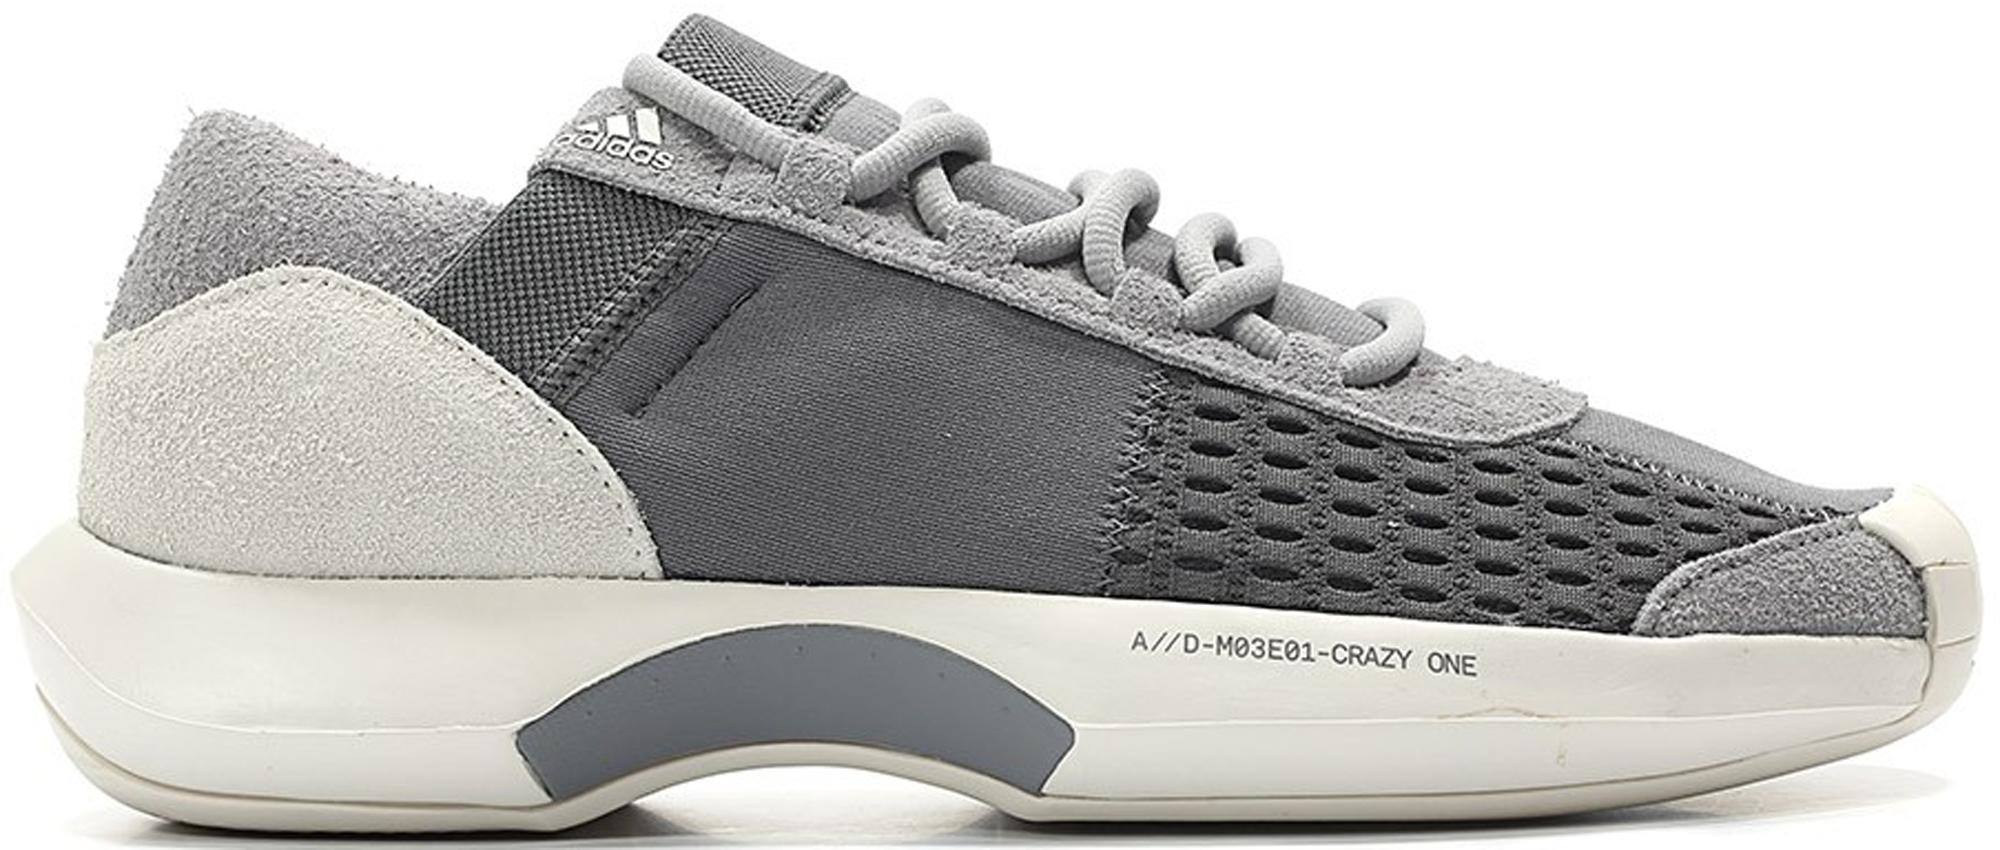 adidas Crazy 1 A//D